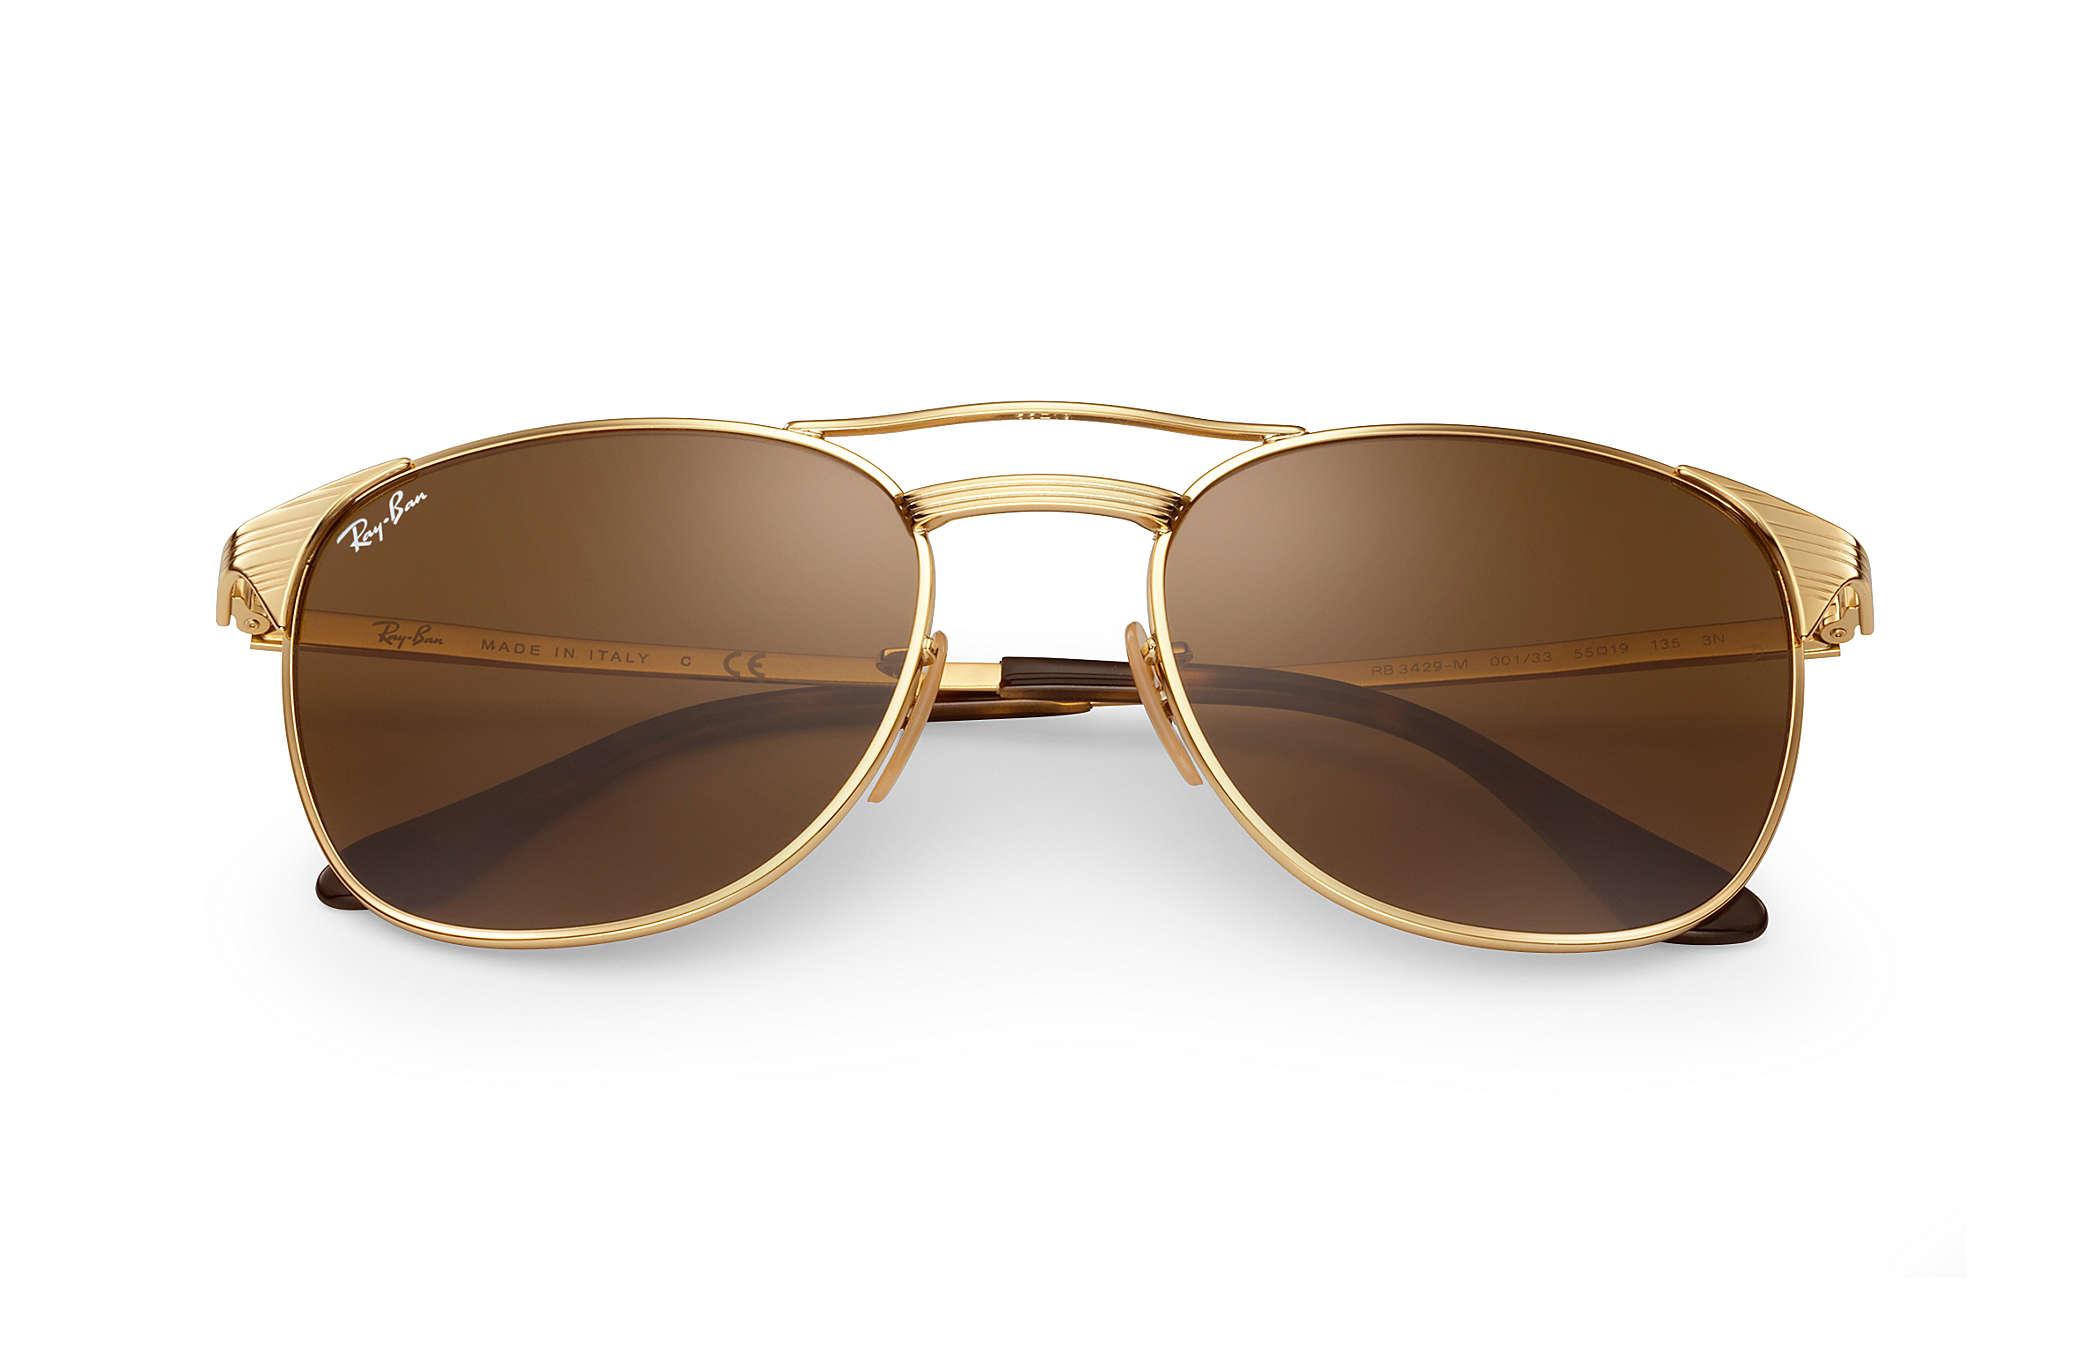 ea7ea0a0dc Ray-Ban Signet RB3429M Gold - Metal - Brown Lenses - 0RB3429M001 ...